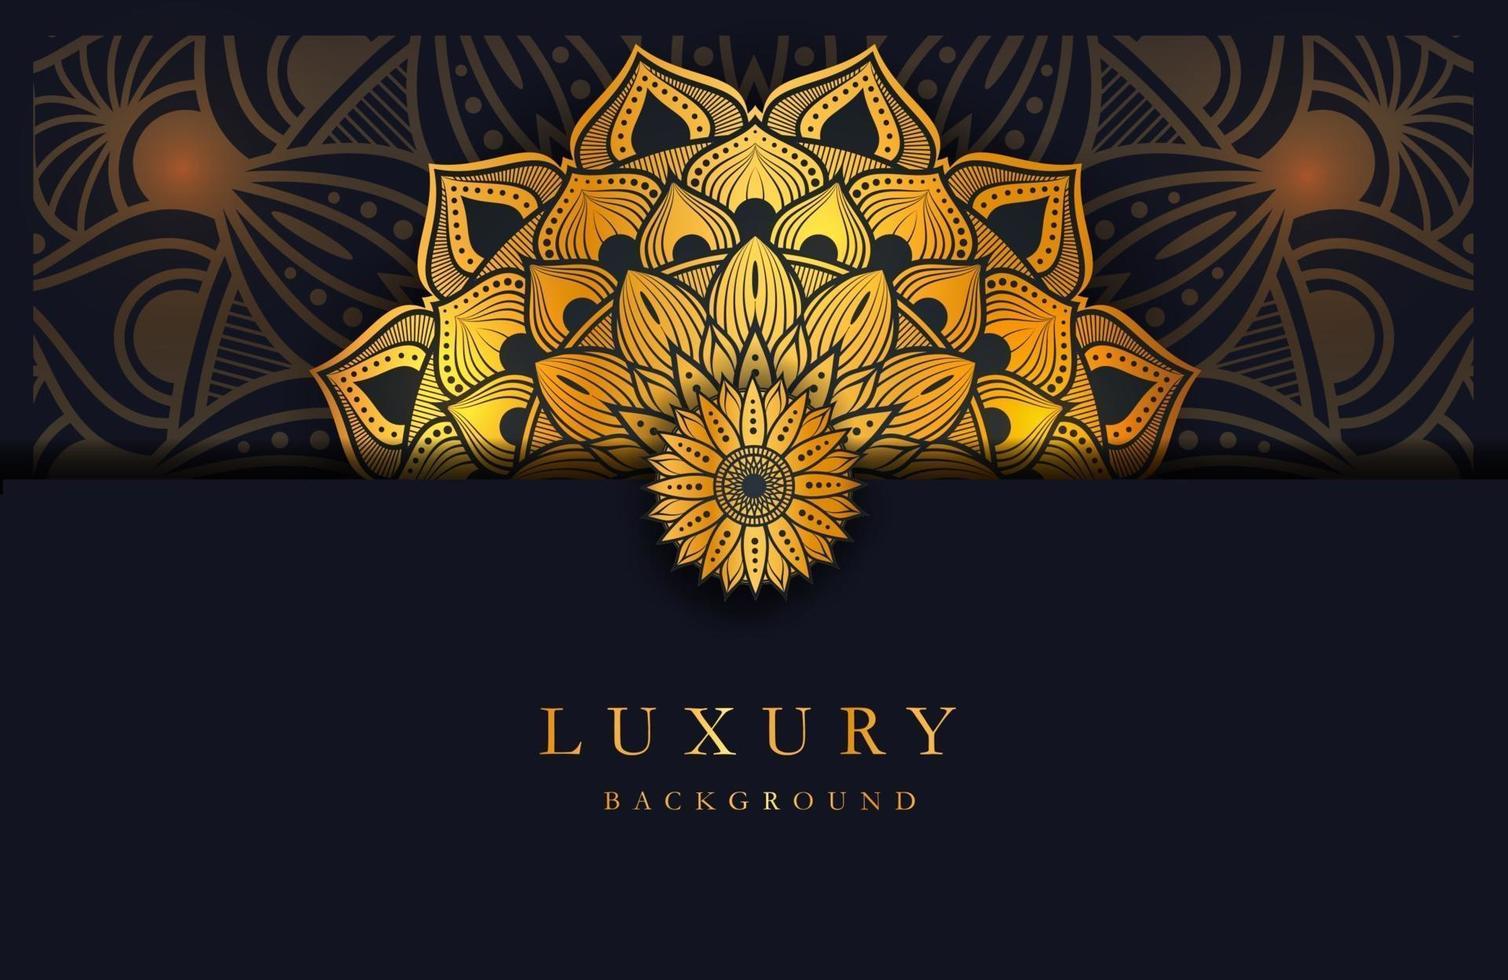 Luxury background with gold islamic arabesque mandala ornament on dark surface vector